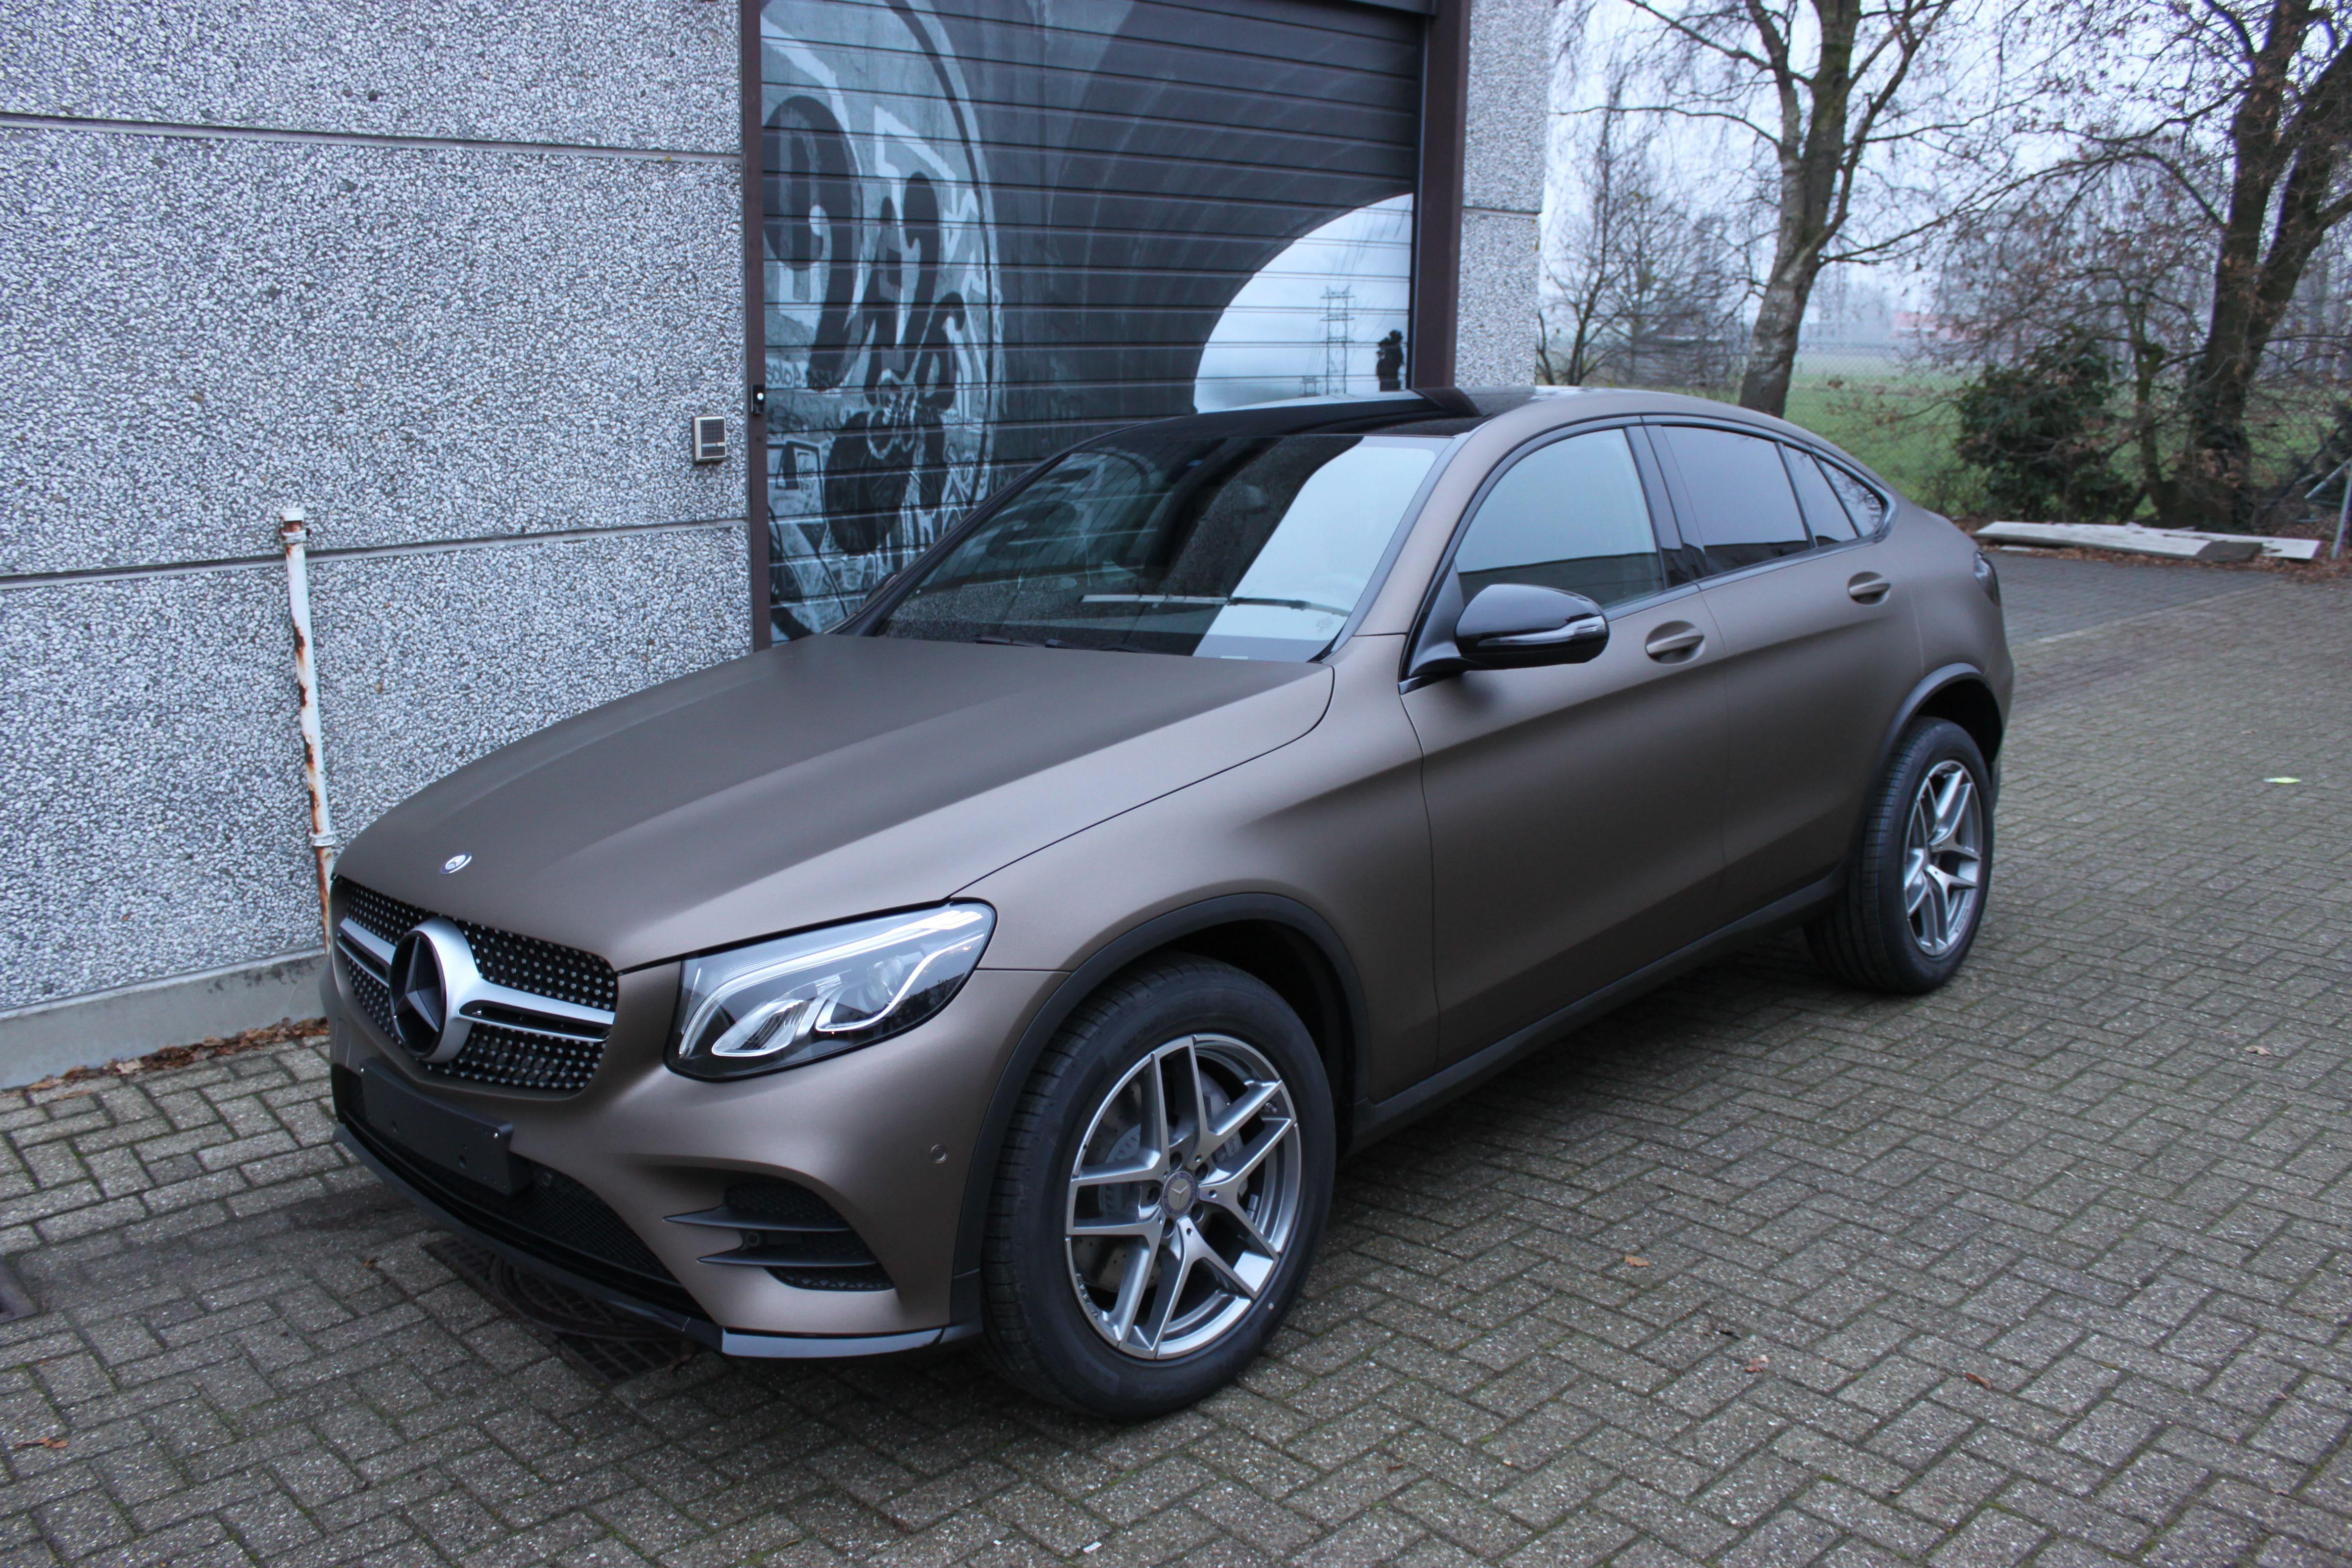 Mercedes GLC Coupe Matte metallic brown, Carwrapping door Wrapmyride.nu Foto-nr:9357, ©2021